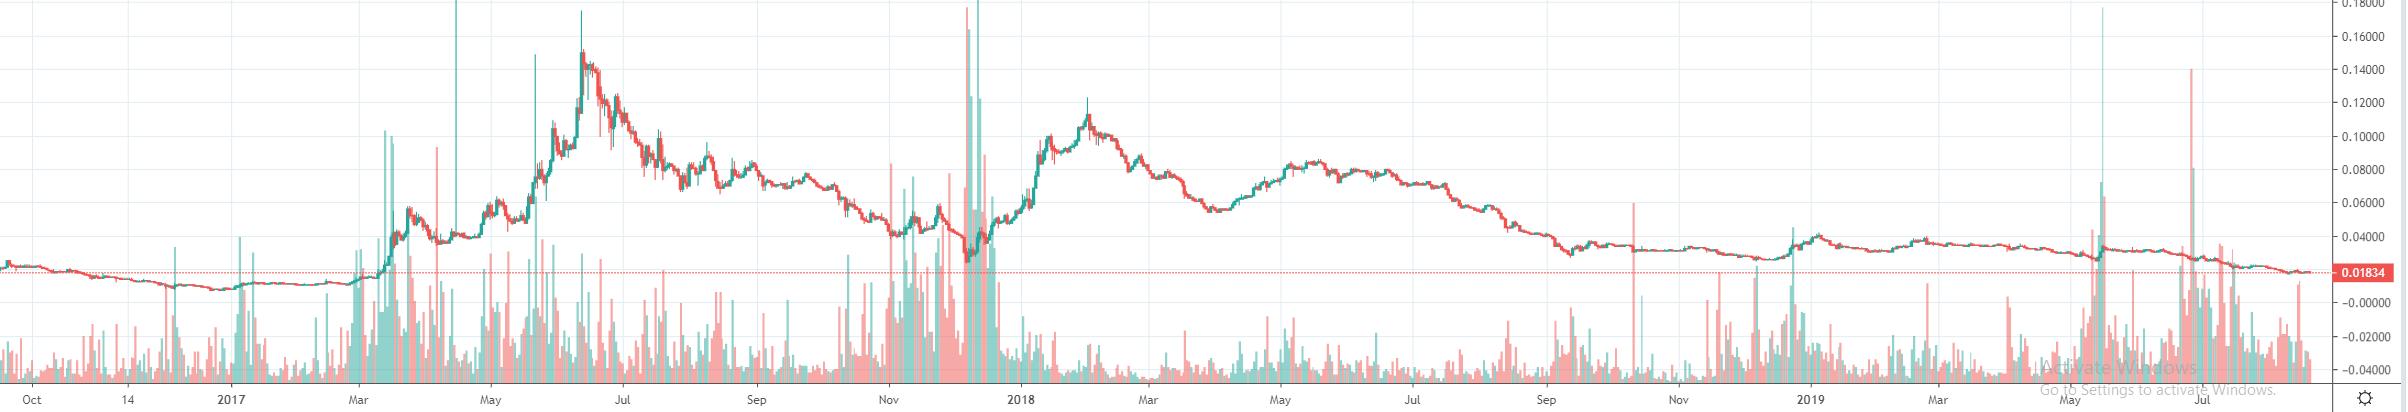 1W ETH/BTC - Coinbase Pro